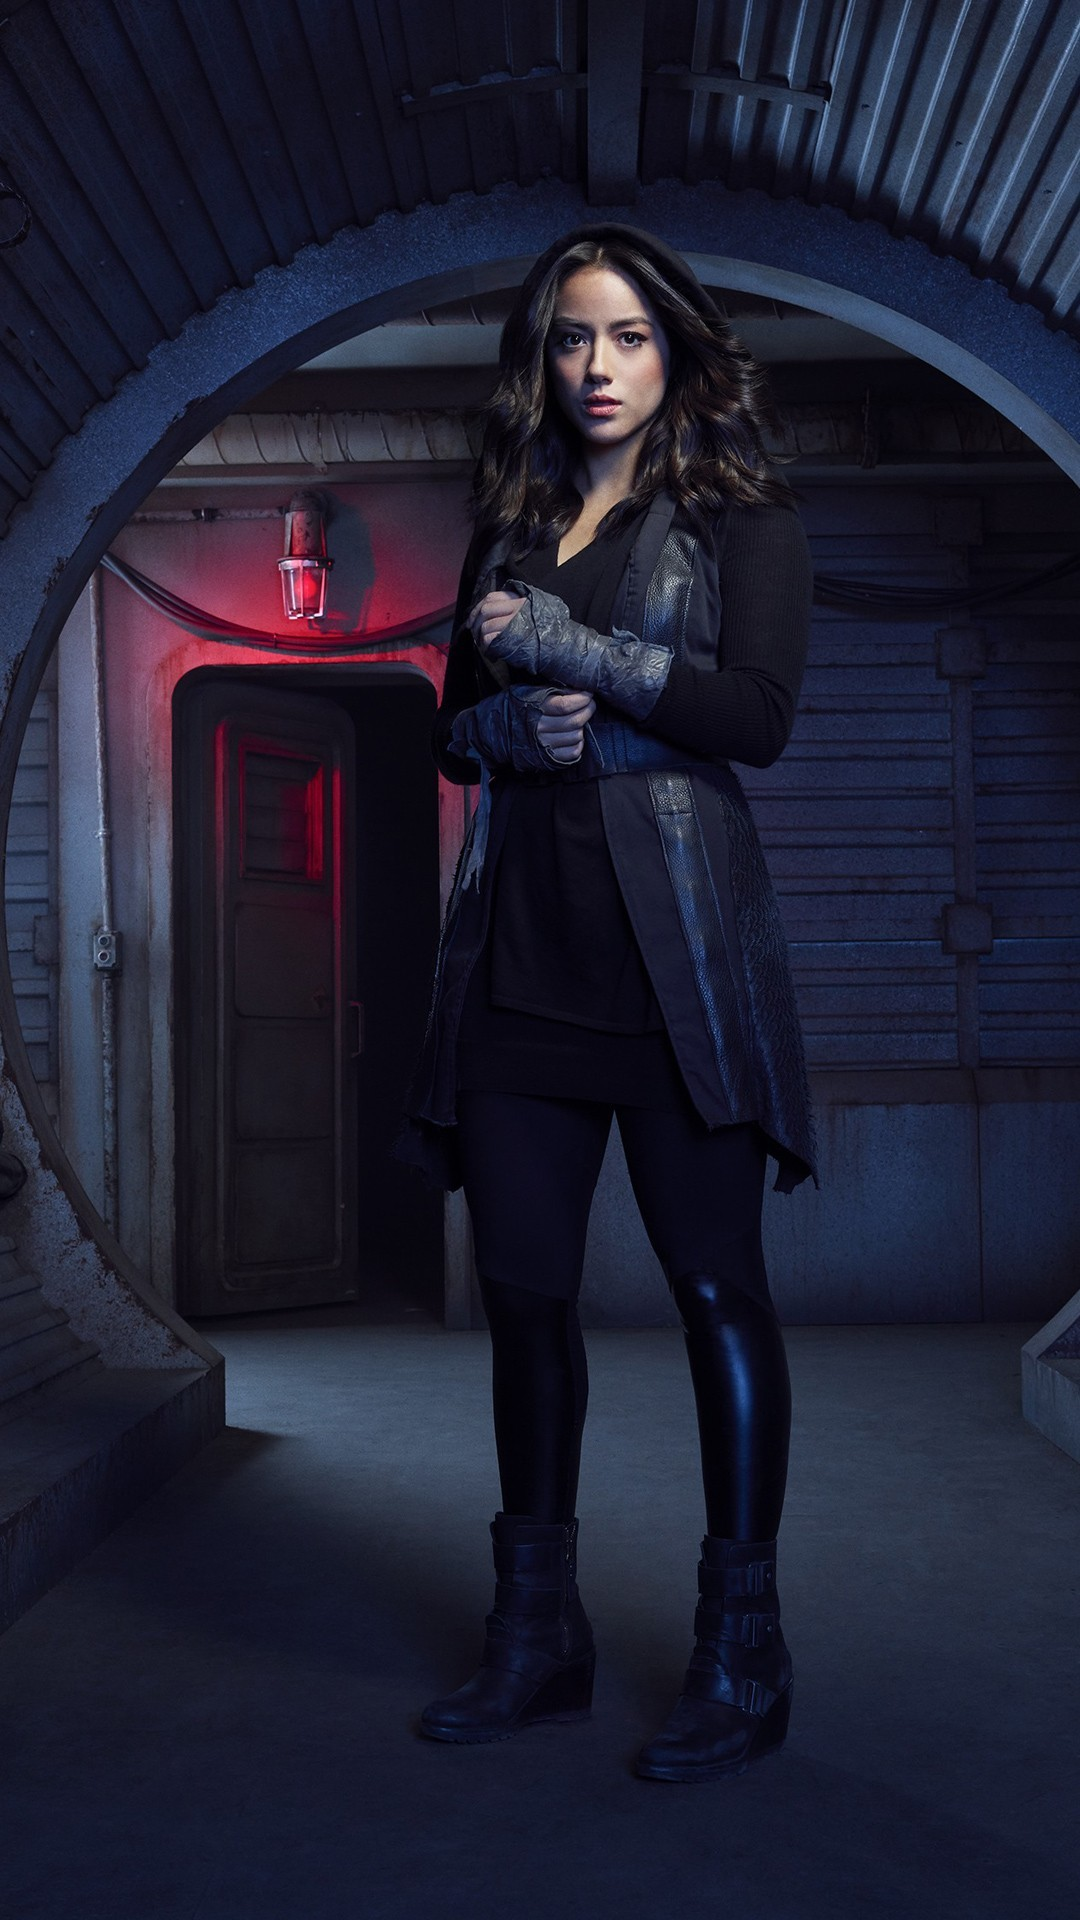 Free Chloe Bennet as Daisy Johnson Agents of SHIELD Season 5 phone wallpaper by killakam23